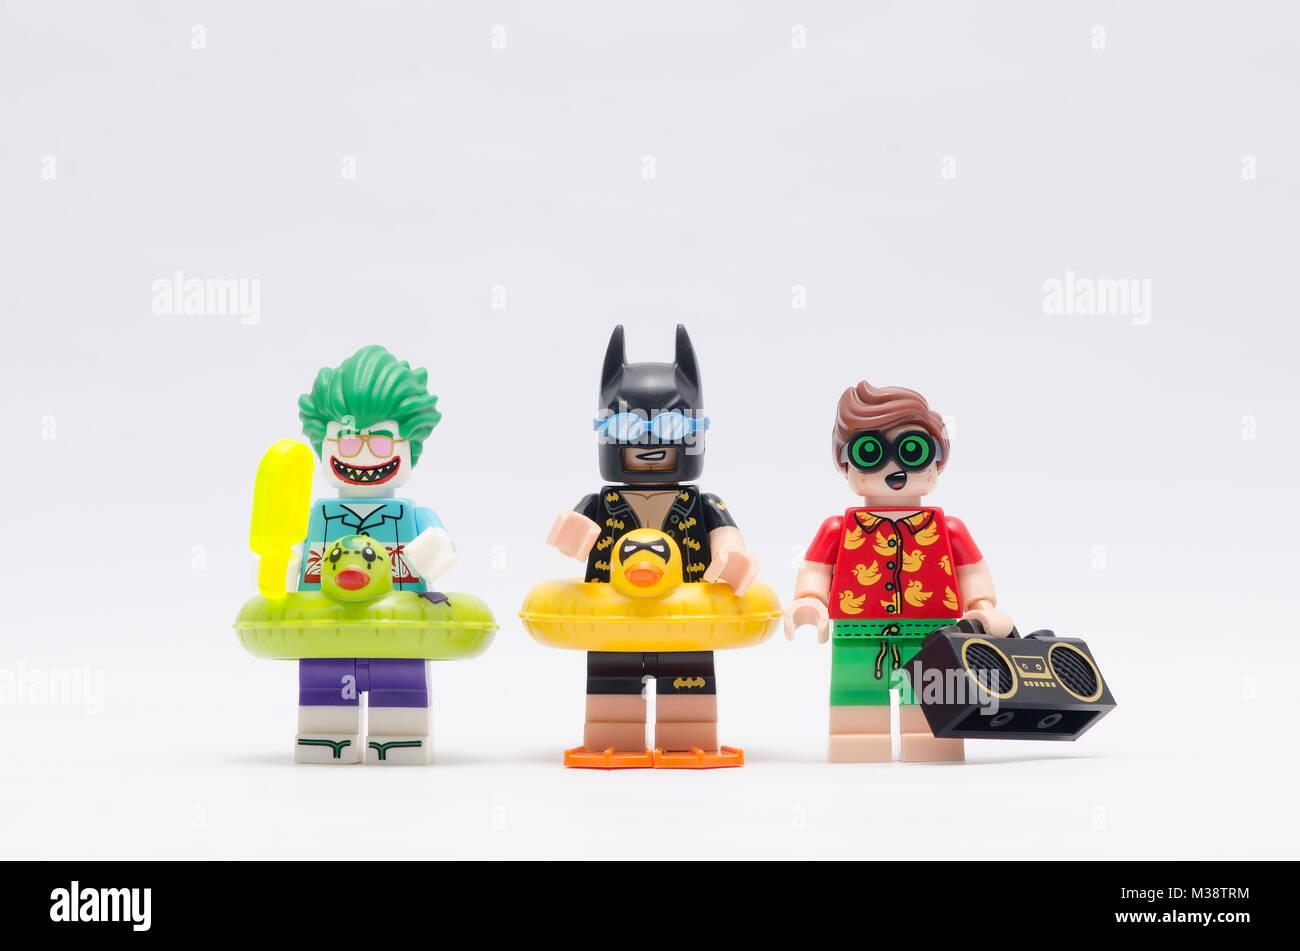 Lego Batman Robin And Joker On Vacation Isolated White Background